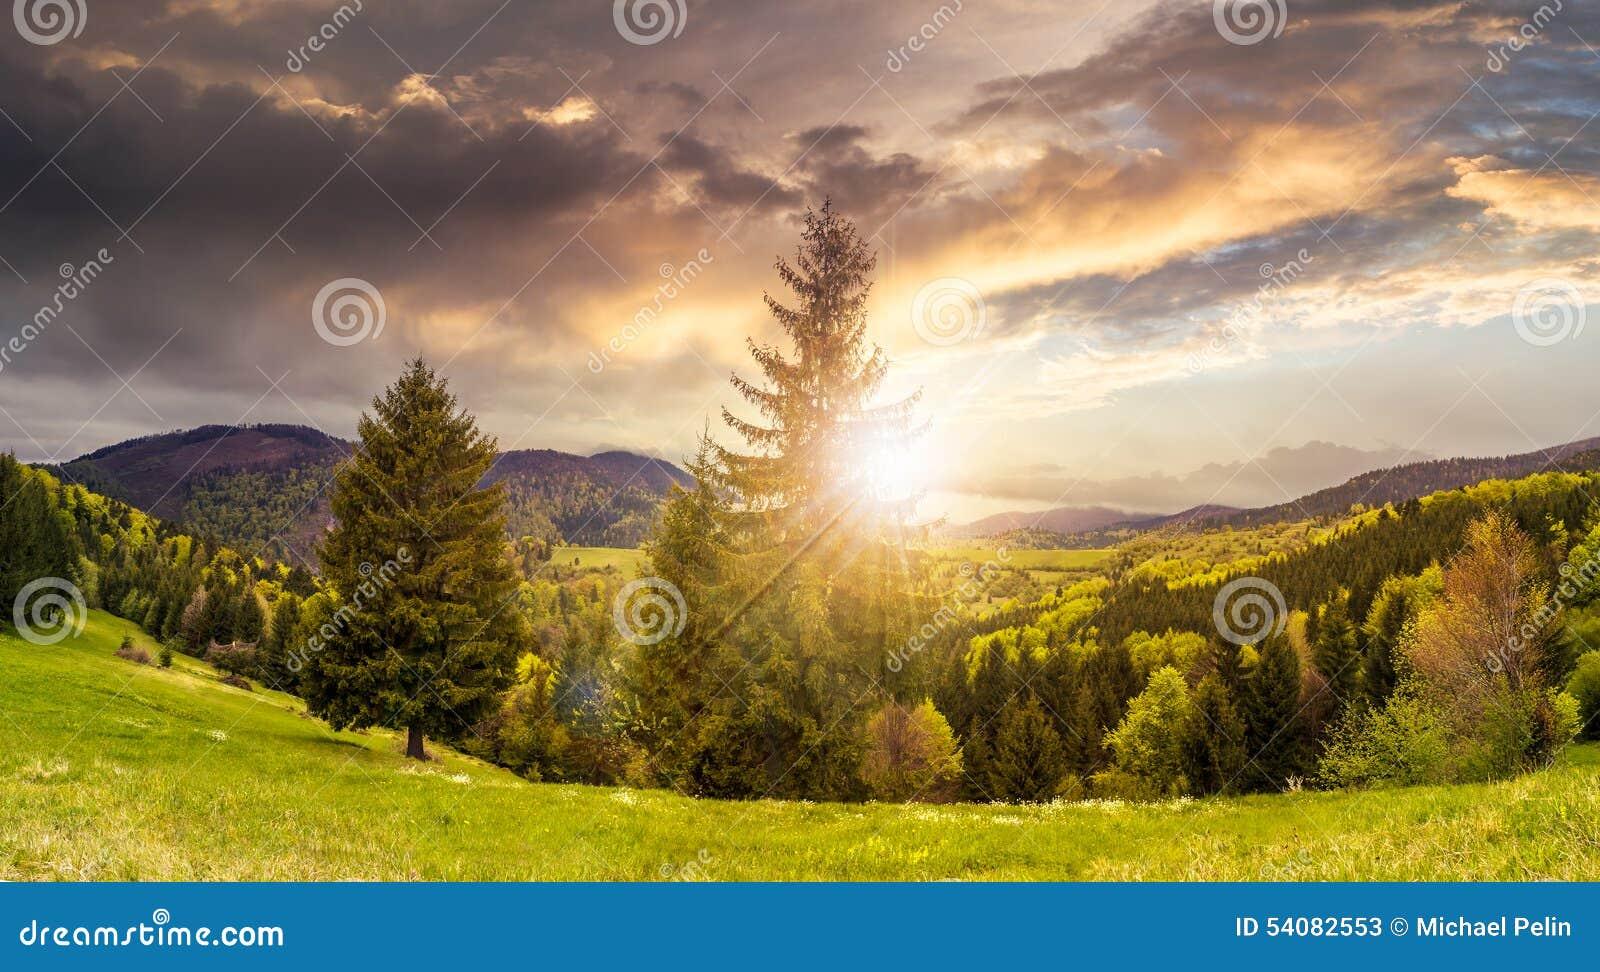 Naaldbos in berg bij zonsondergang